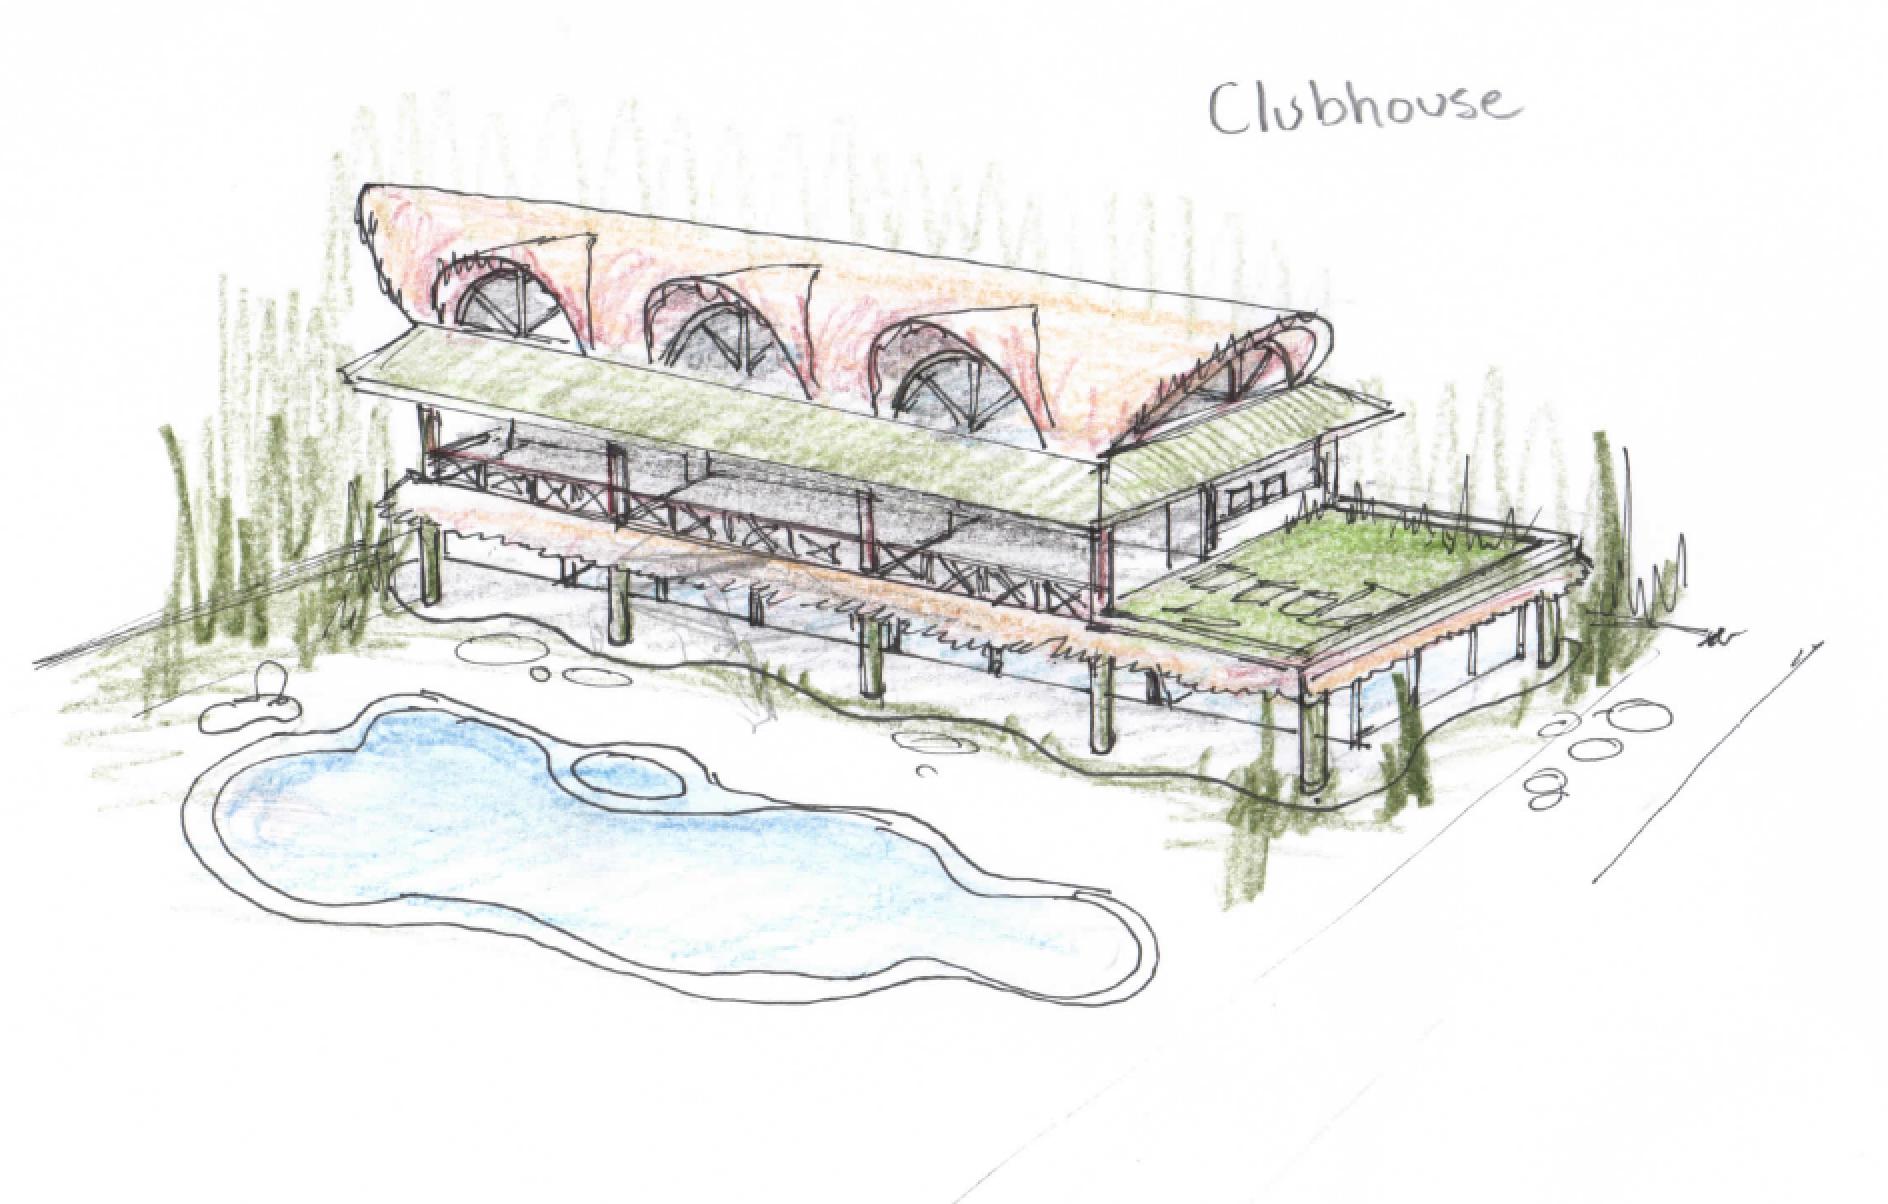 ola-verde-clubhouse